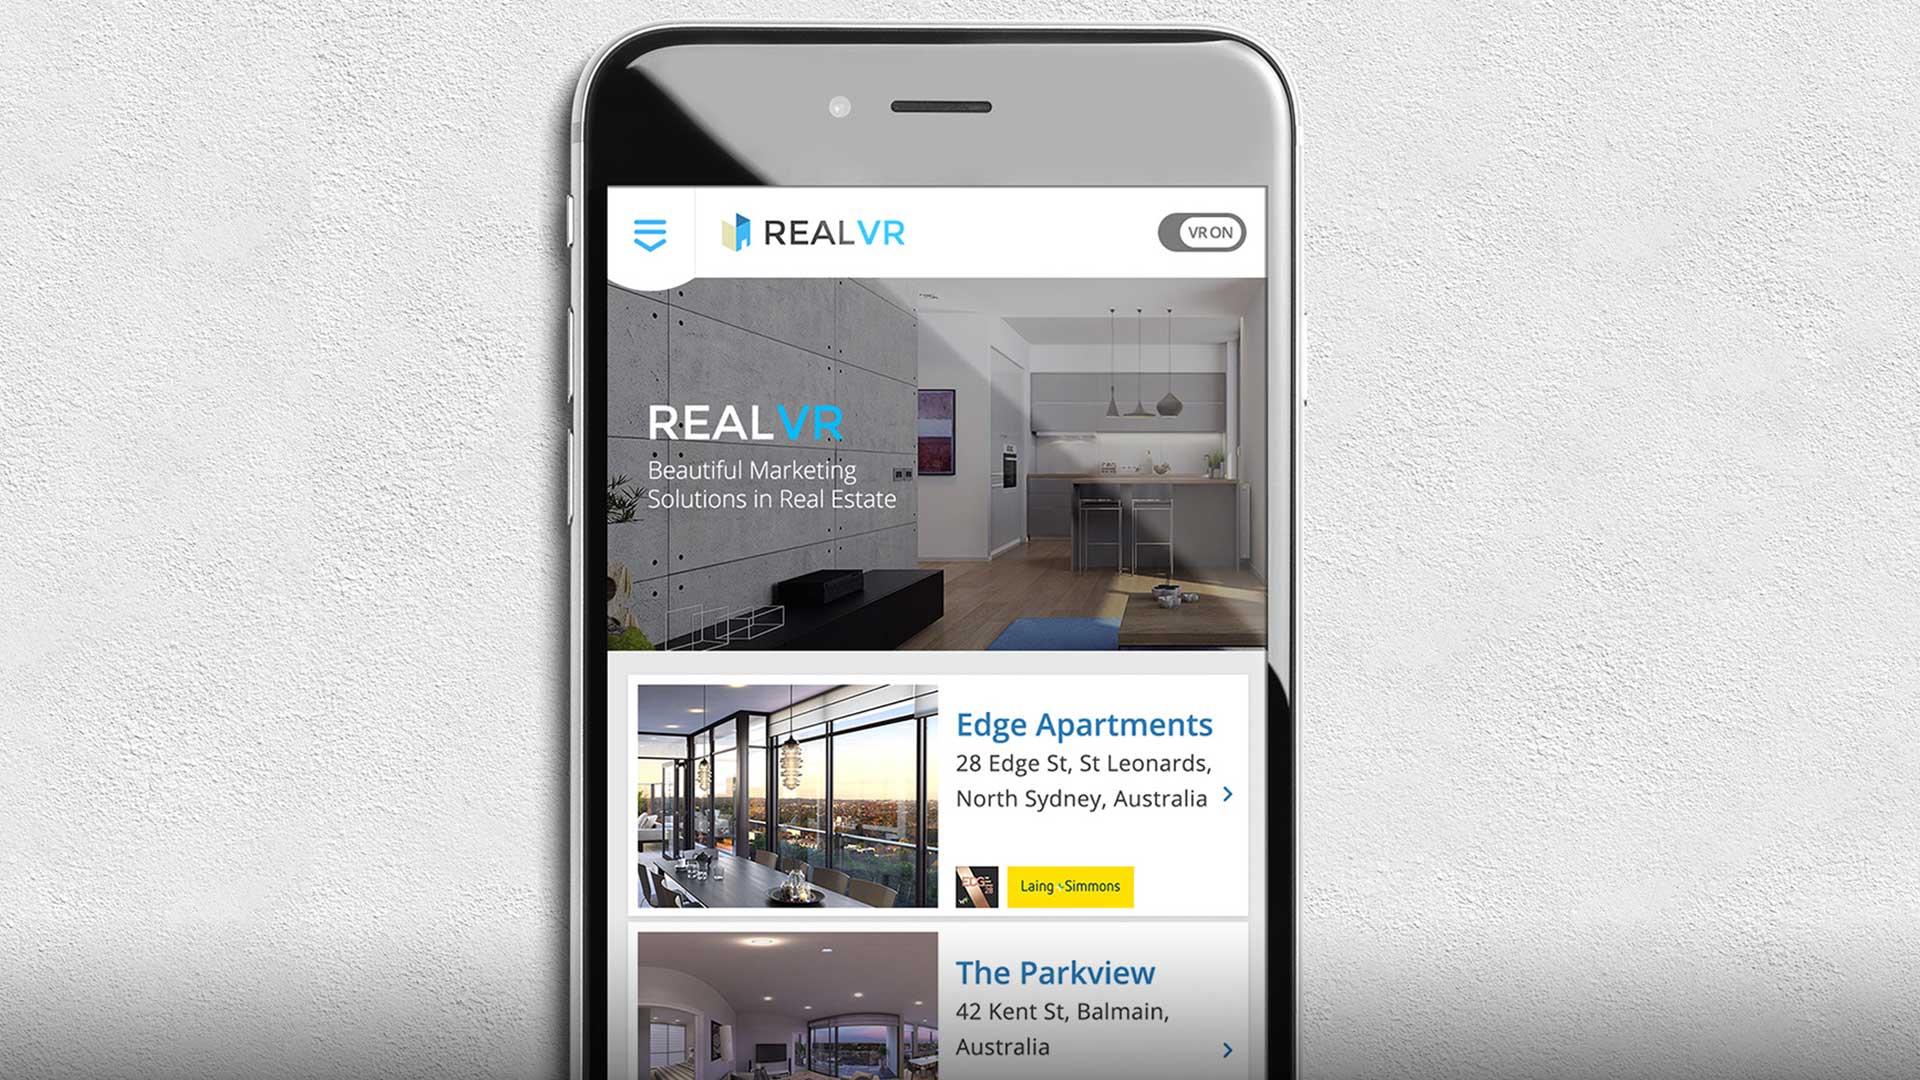 Real VR home screen mockup